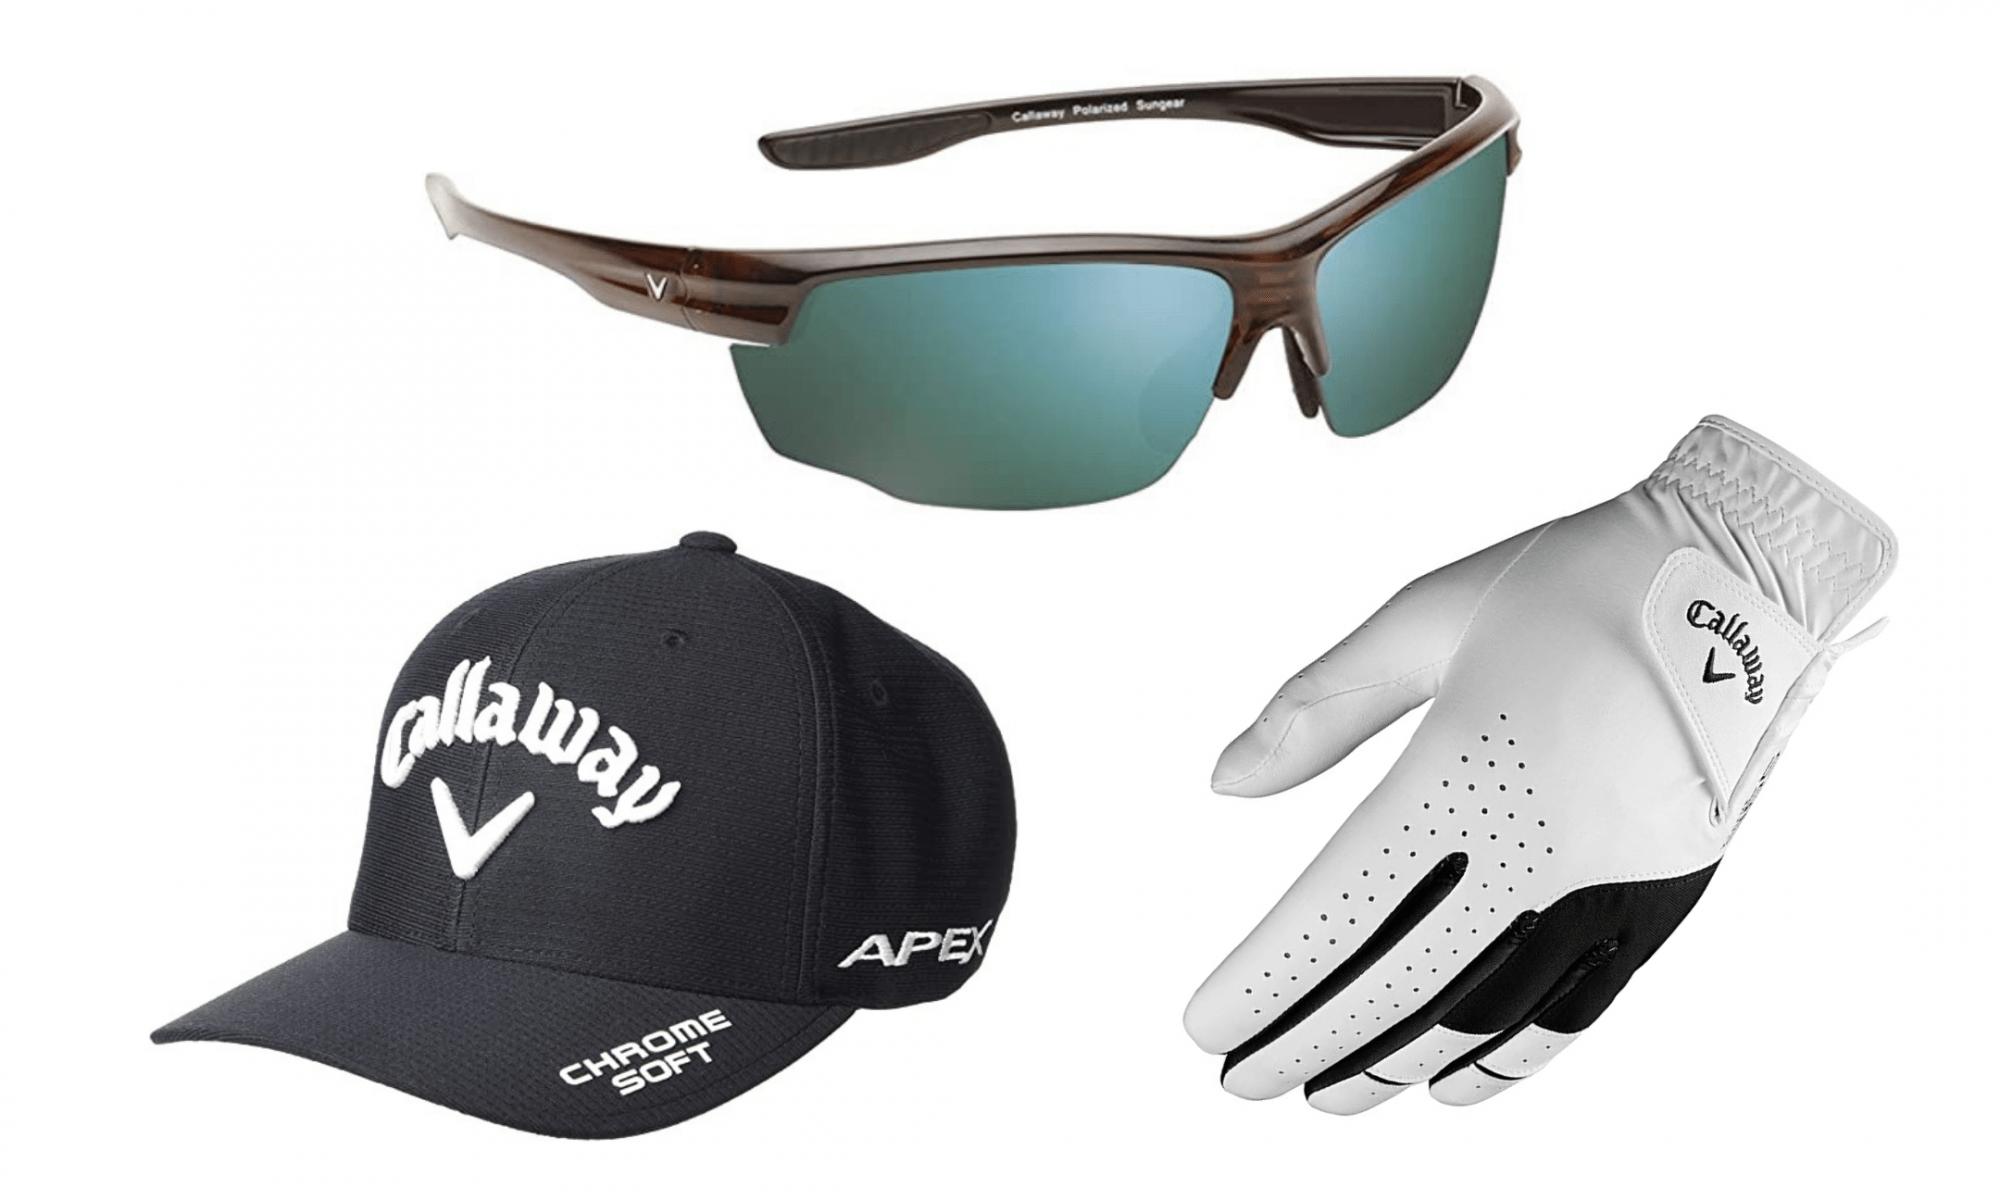 USA 🇺🇸 / UK 🇬🇧 ⛳️ CALLAWAY SPECIAL • Caps • Gloves • Sunglasses • Golf Balls • Clothes • Shoes